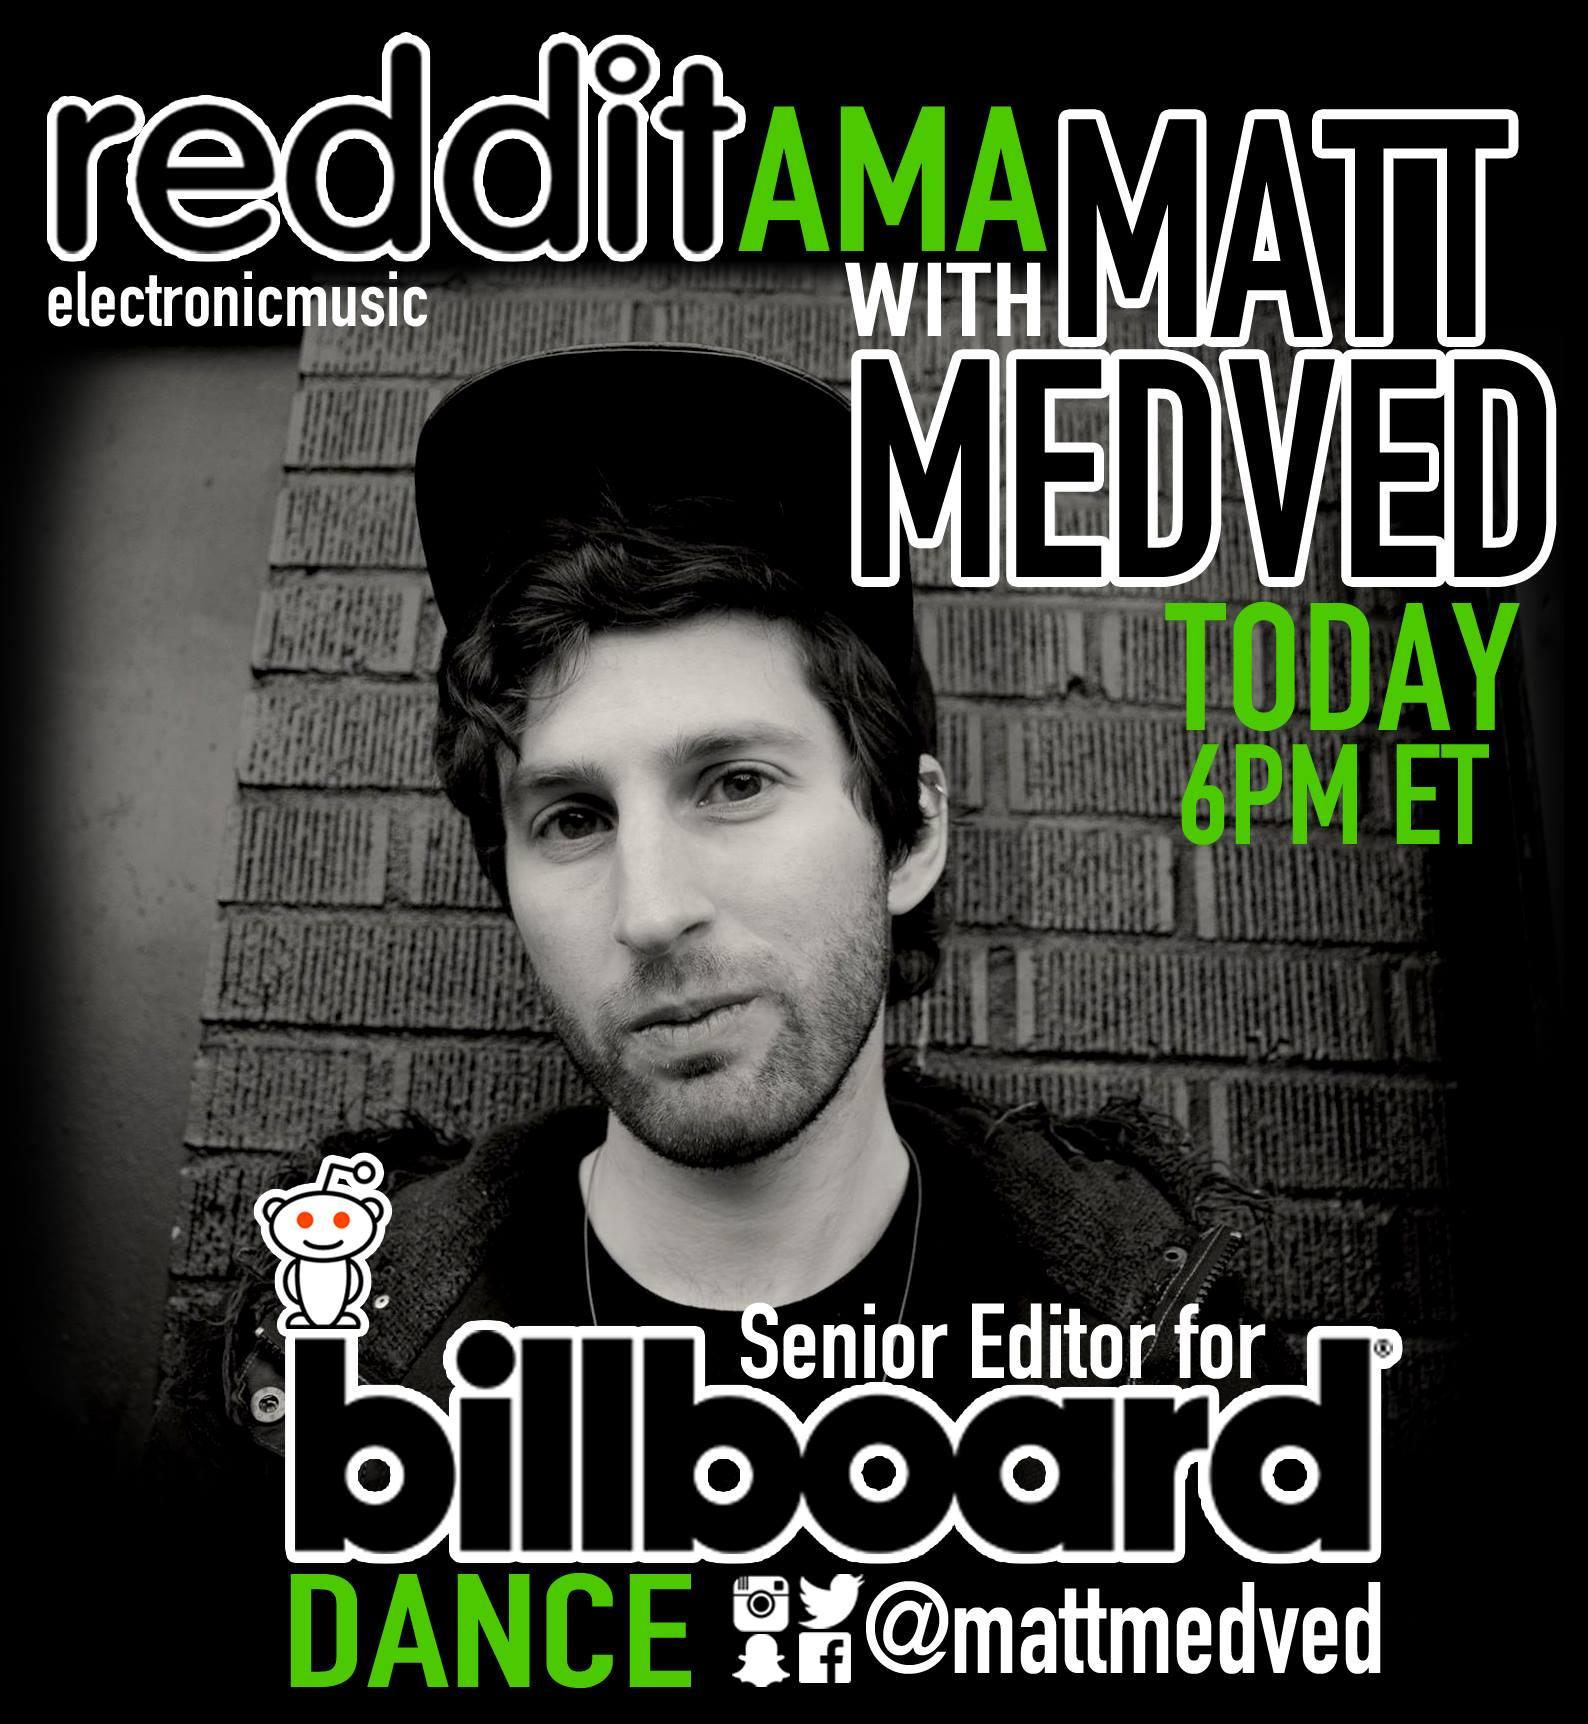 Ask Billboards Matt Medved Anything On Reddit Today At 6PM ET